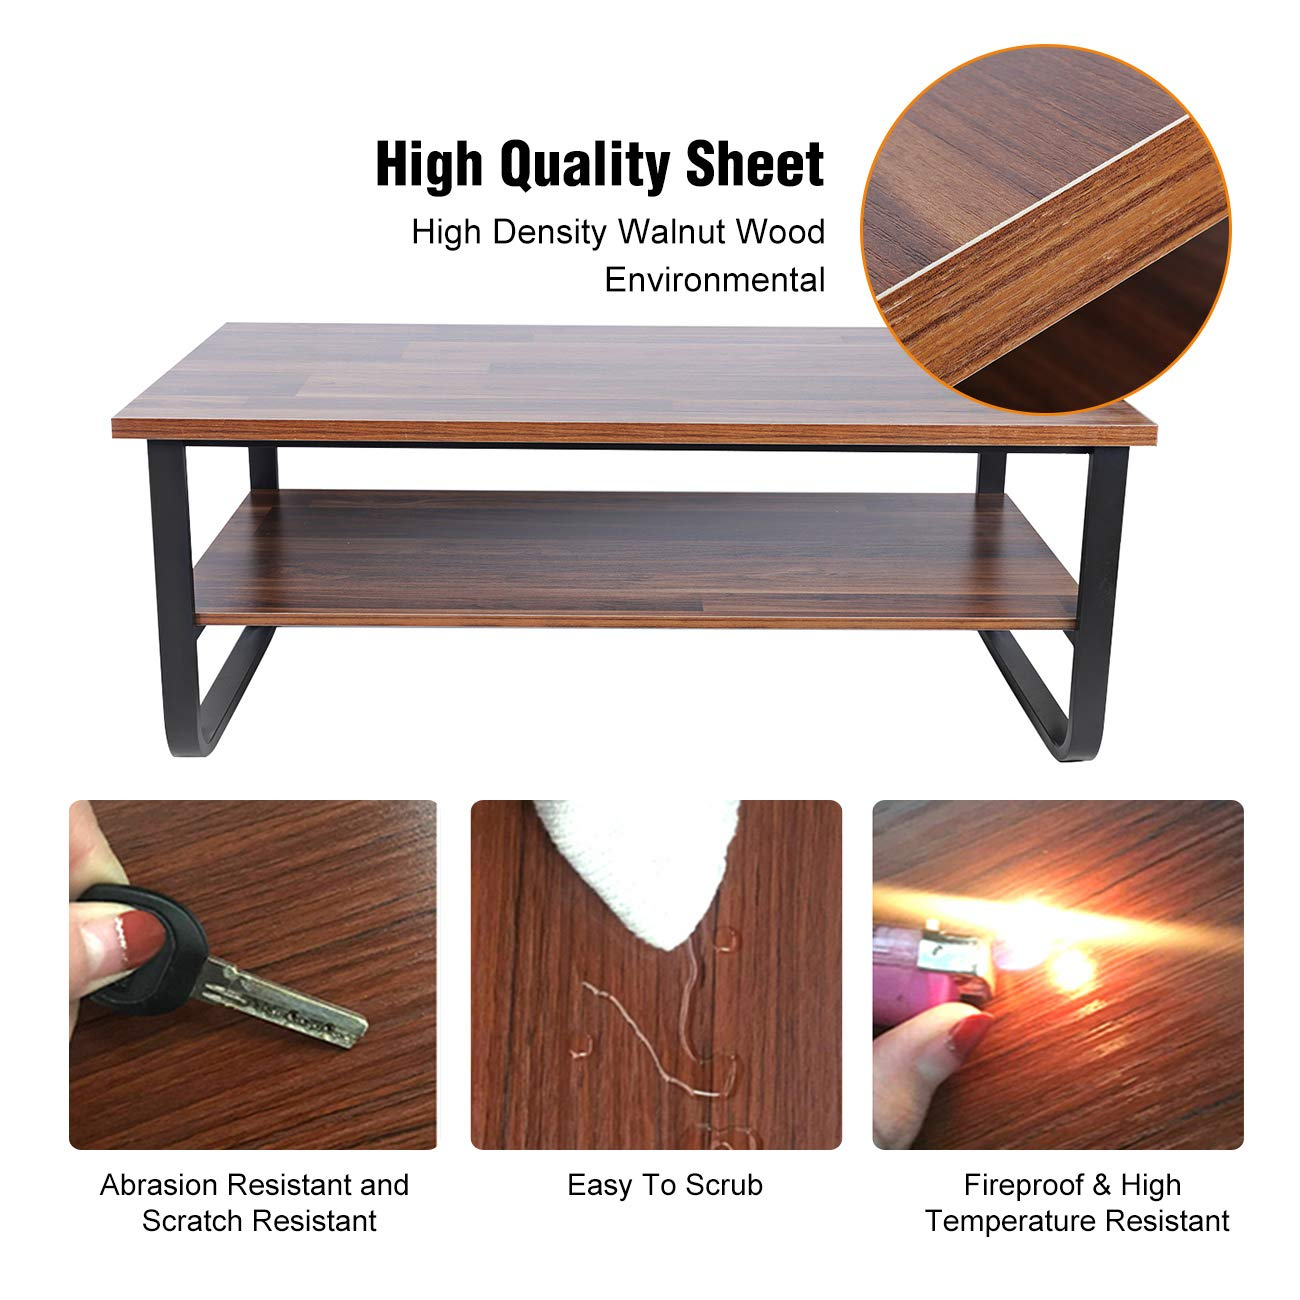 BEAMNOVA 47x24x18 Coffee Table with Storage for Living Room End Table Rustic Vintage Iron and Wood Set Tea Table